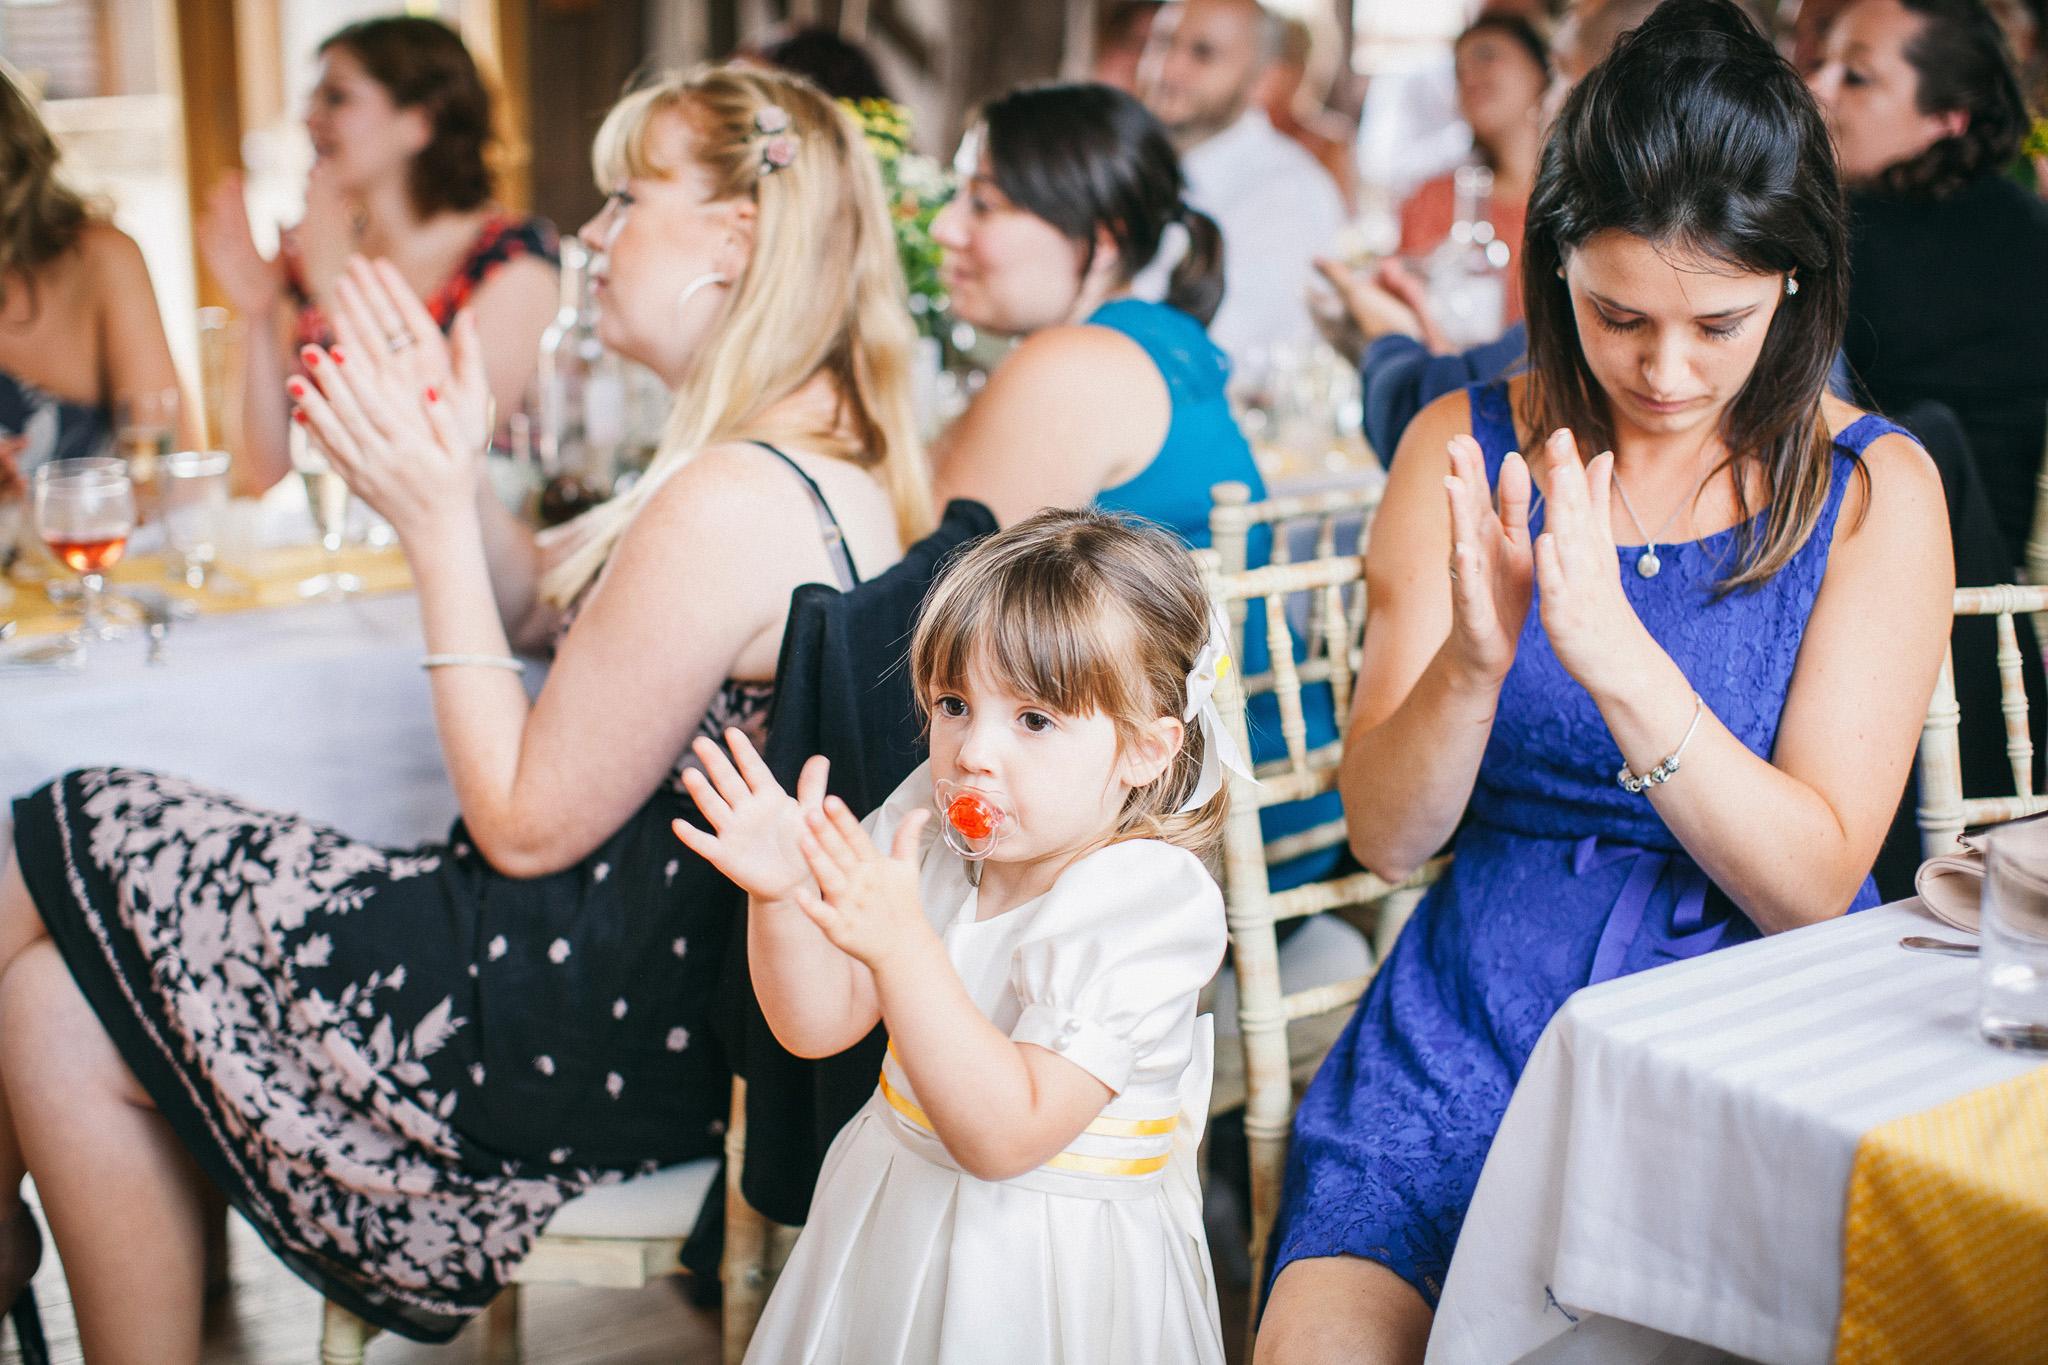 chantry_sussex_barn_wedding_348.jpg